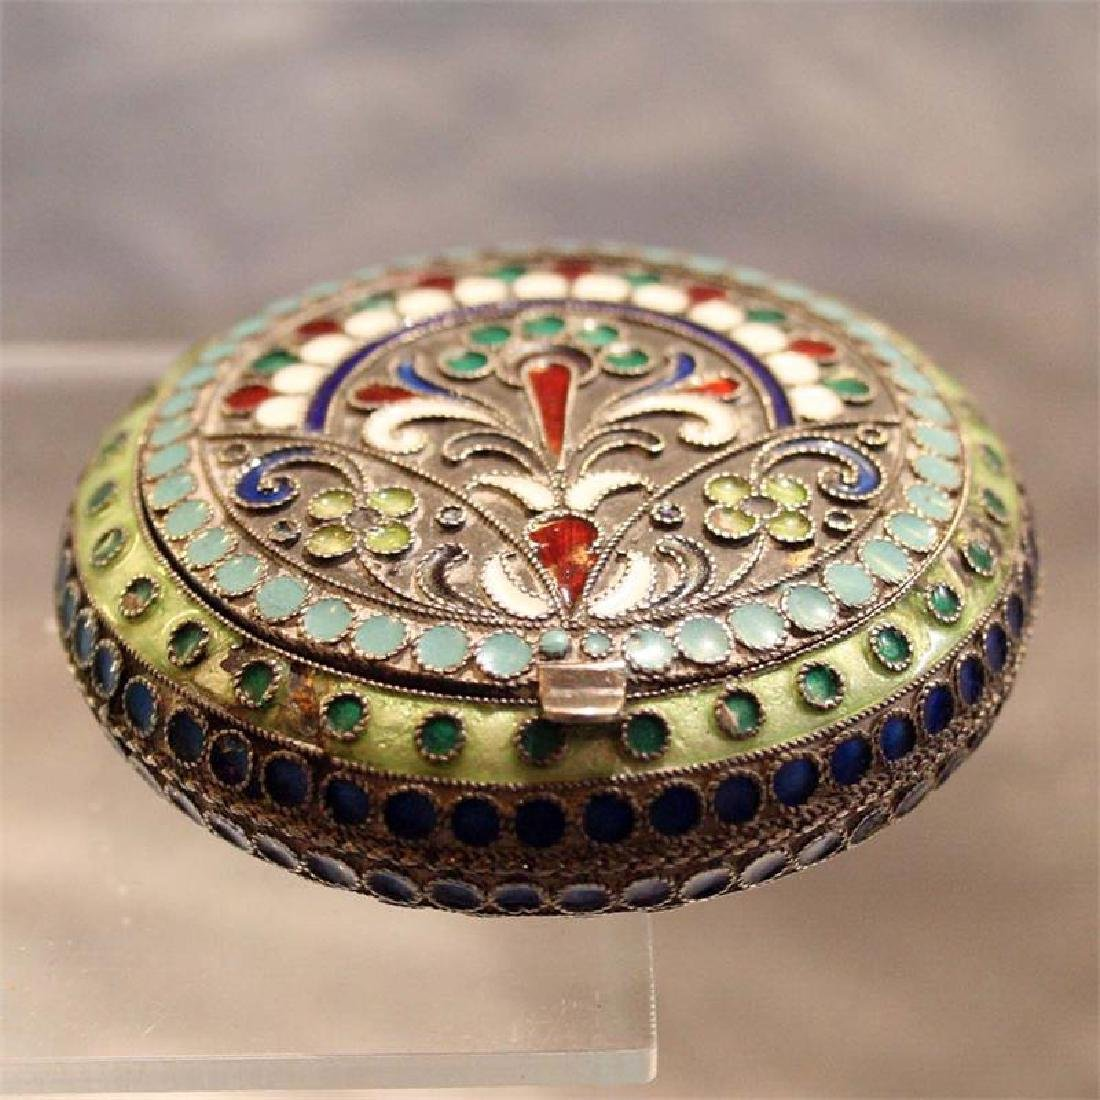 Antique Russian Silver-Gilt and Enamel Powder Case